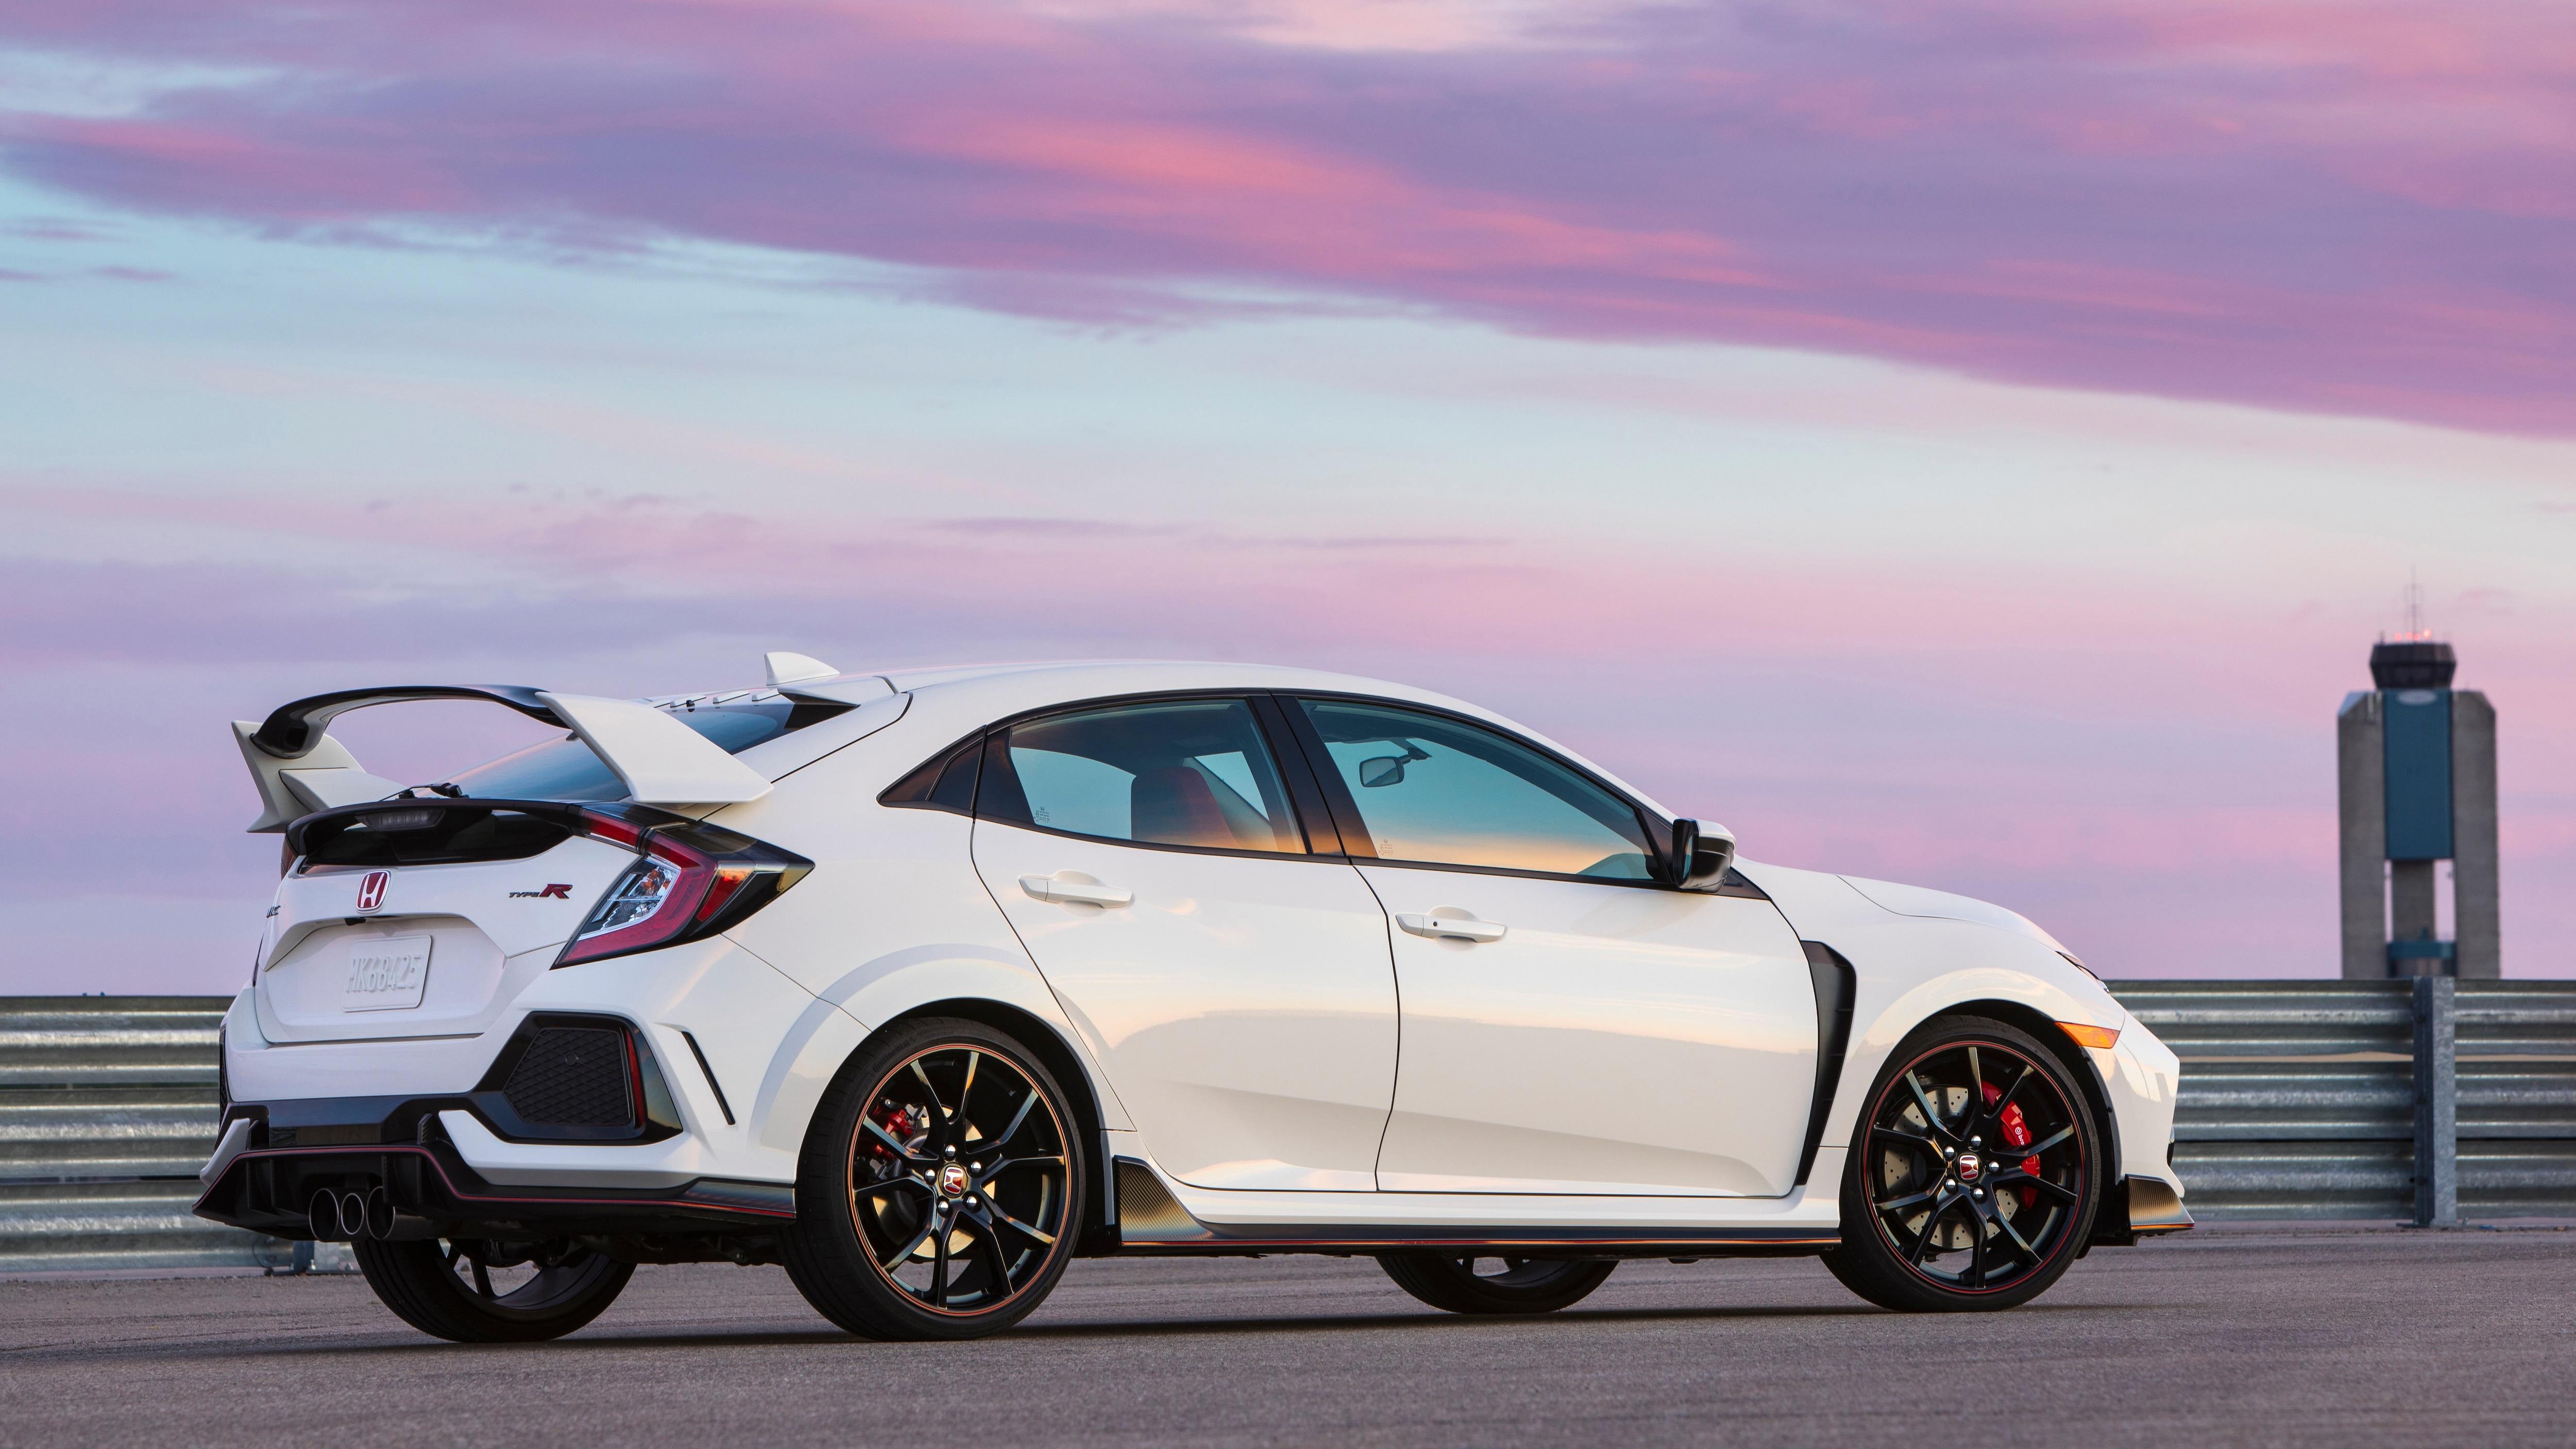 2019 Honda Civic Type R Rear Three Quarter